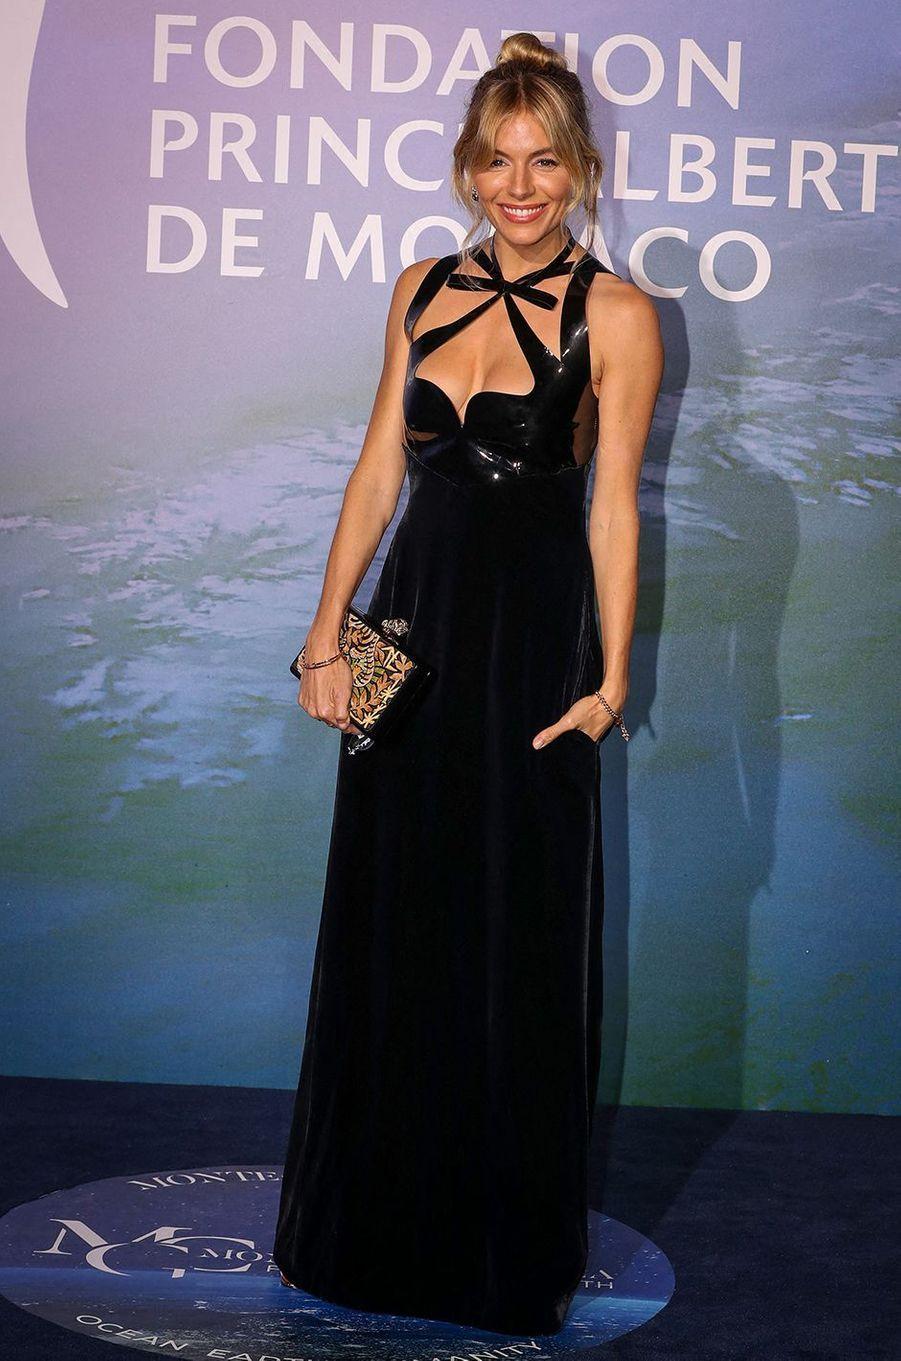 Sienna MillerauMonte-Carlo Gala for Planetary Health organisé par la Fondation Prince Albert II de Monaco le 24 septembre 2020